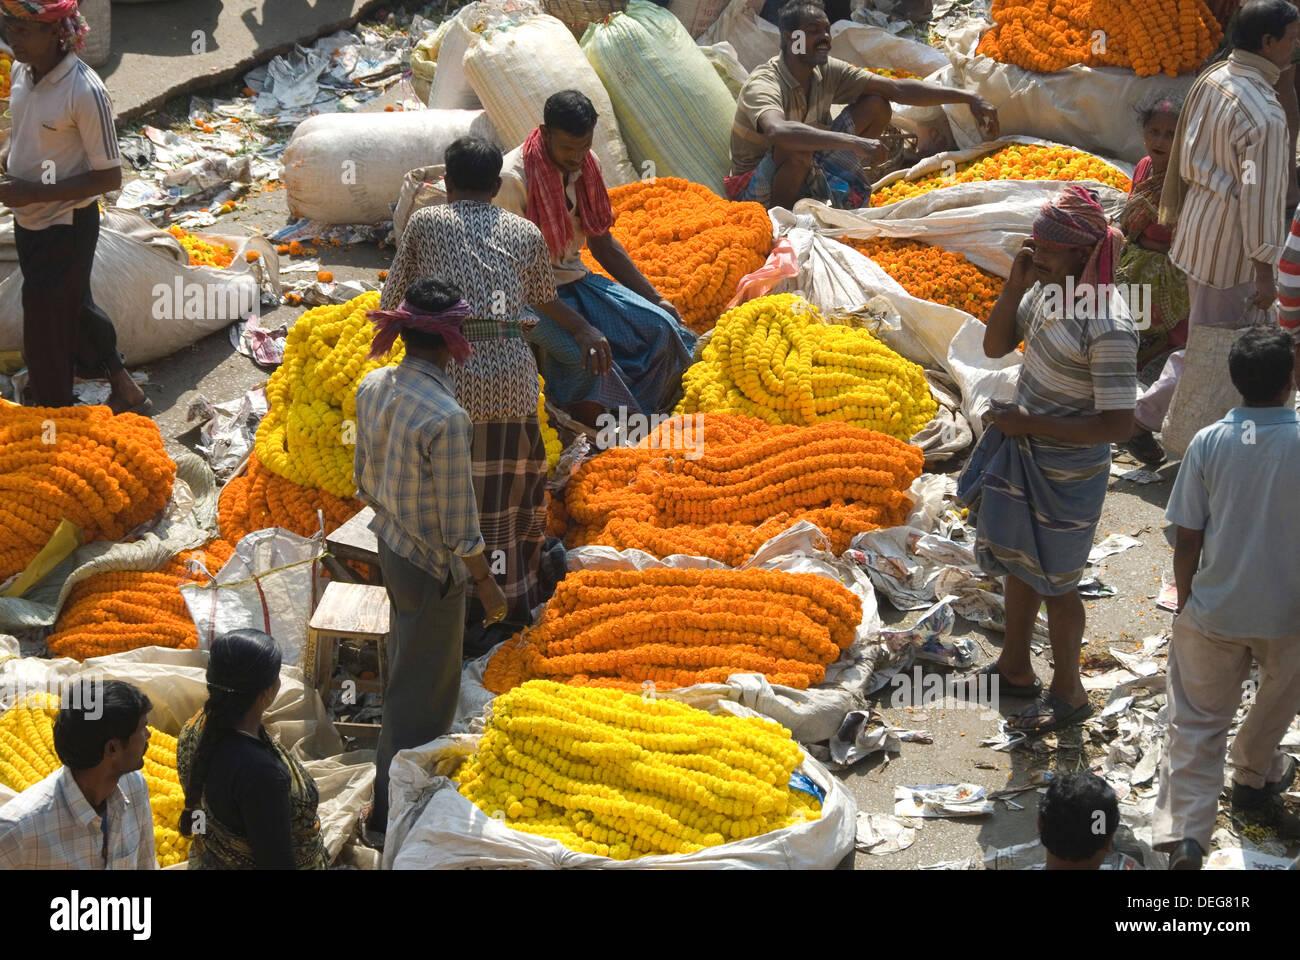 Armenia Ghat flower market, Kolkata (Calcutta), West Bengal, India, Asia - Stock Image